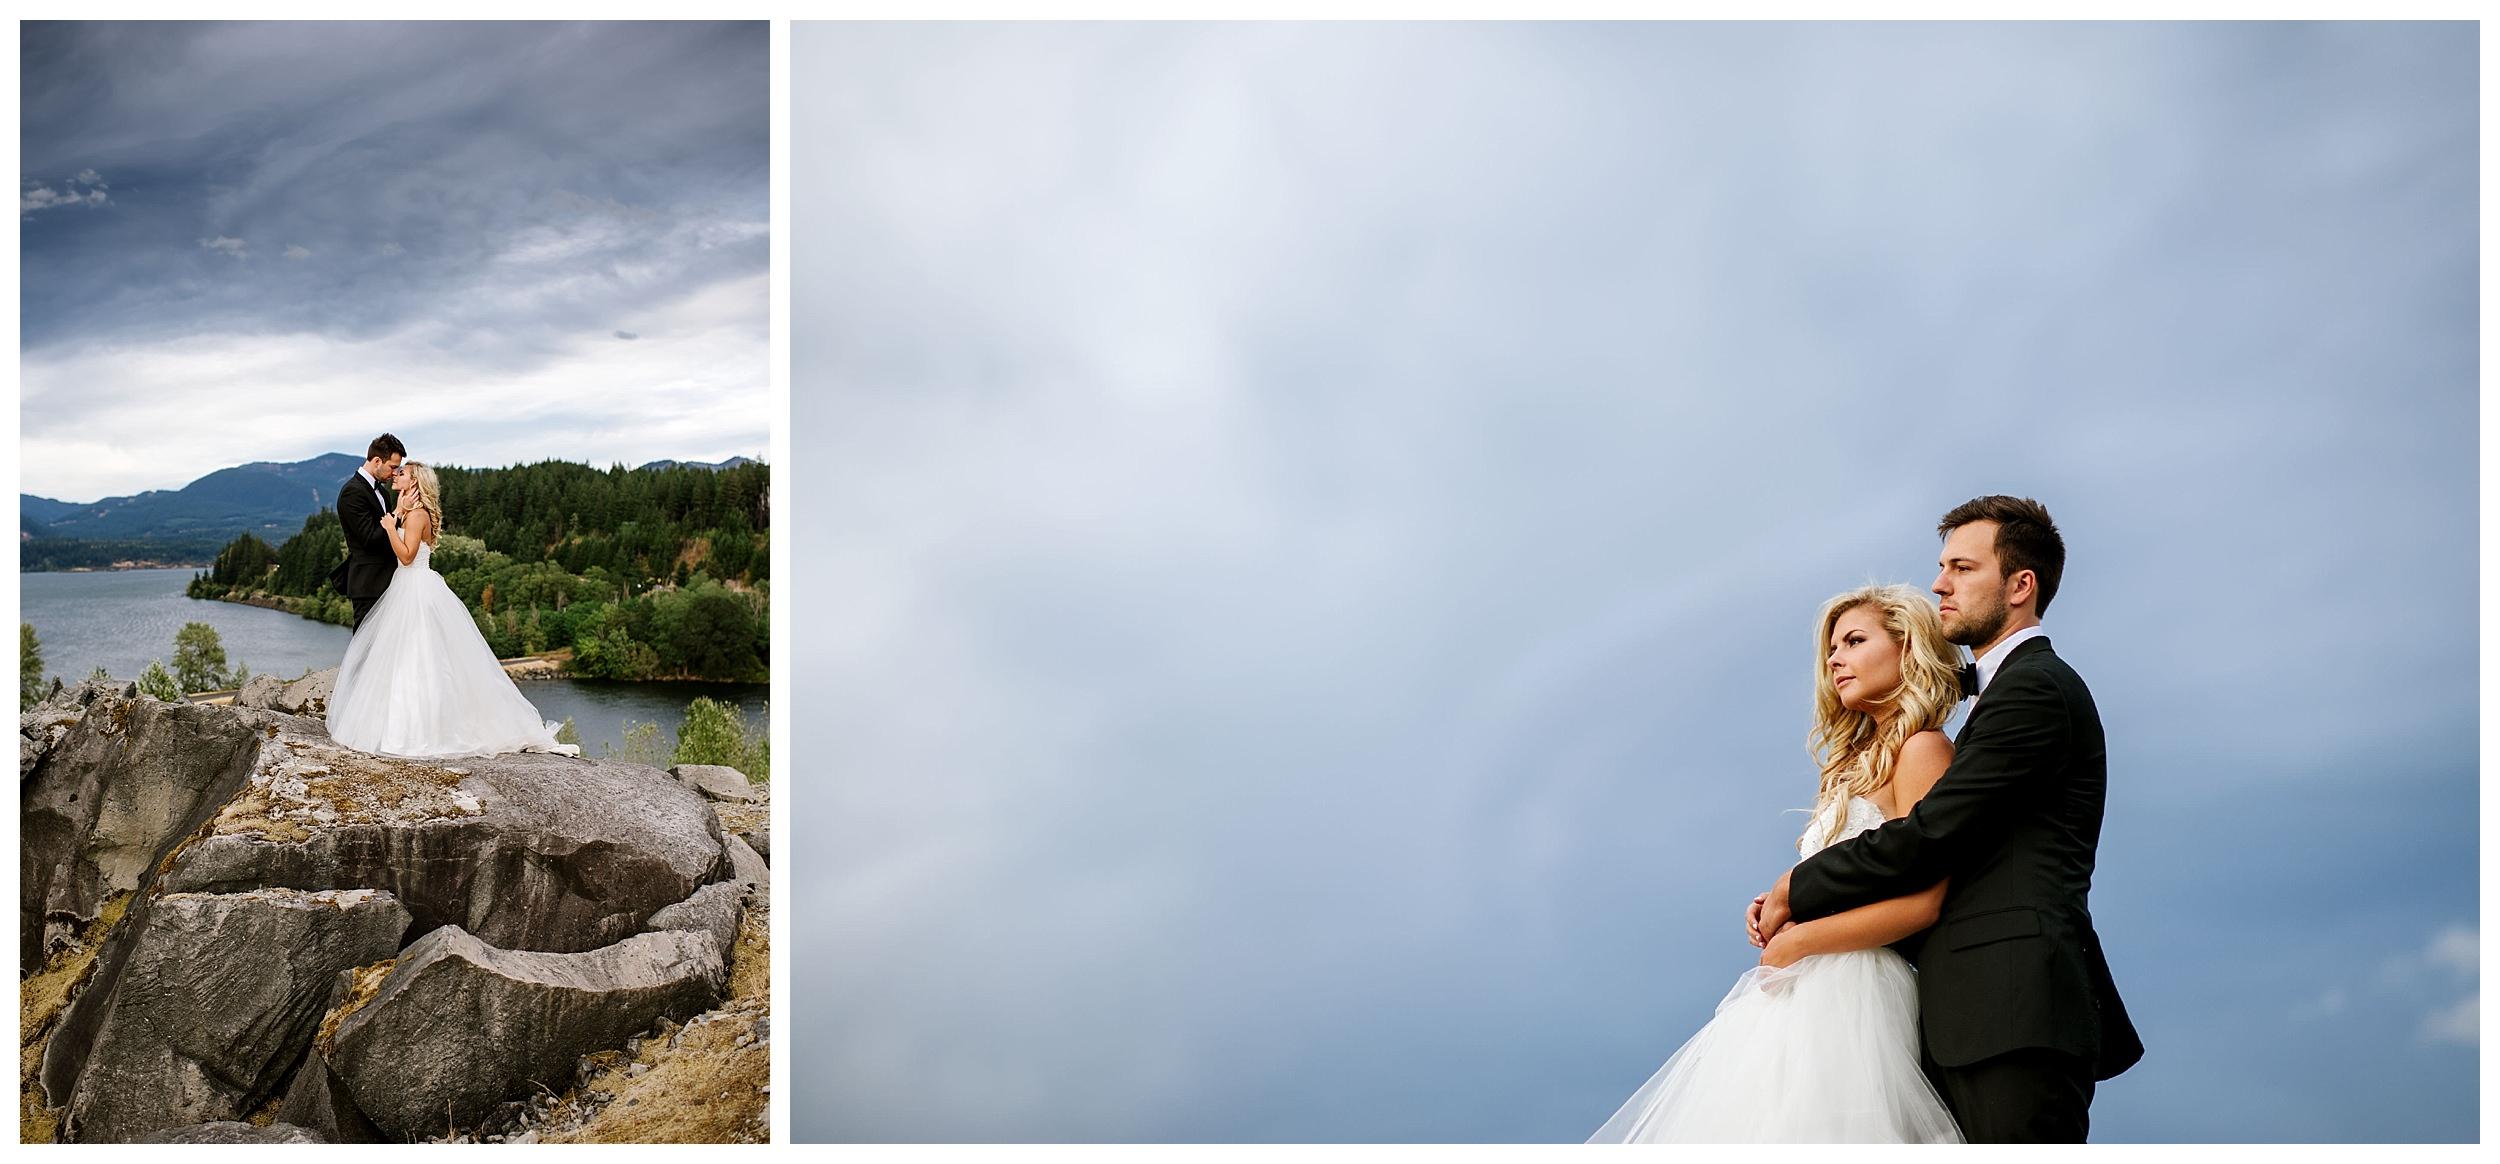 Portland-Wedding-Photographer-Columbia-River-Gorge-Wedding35.jpg